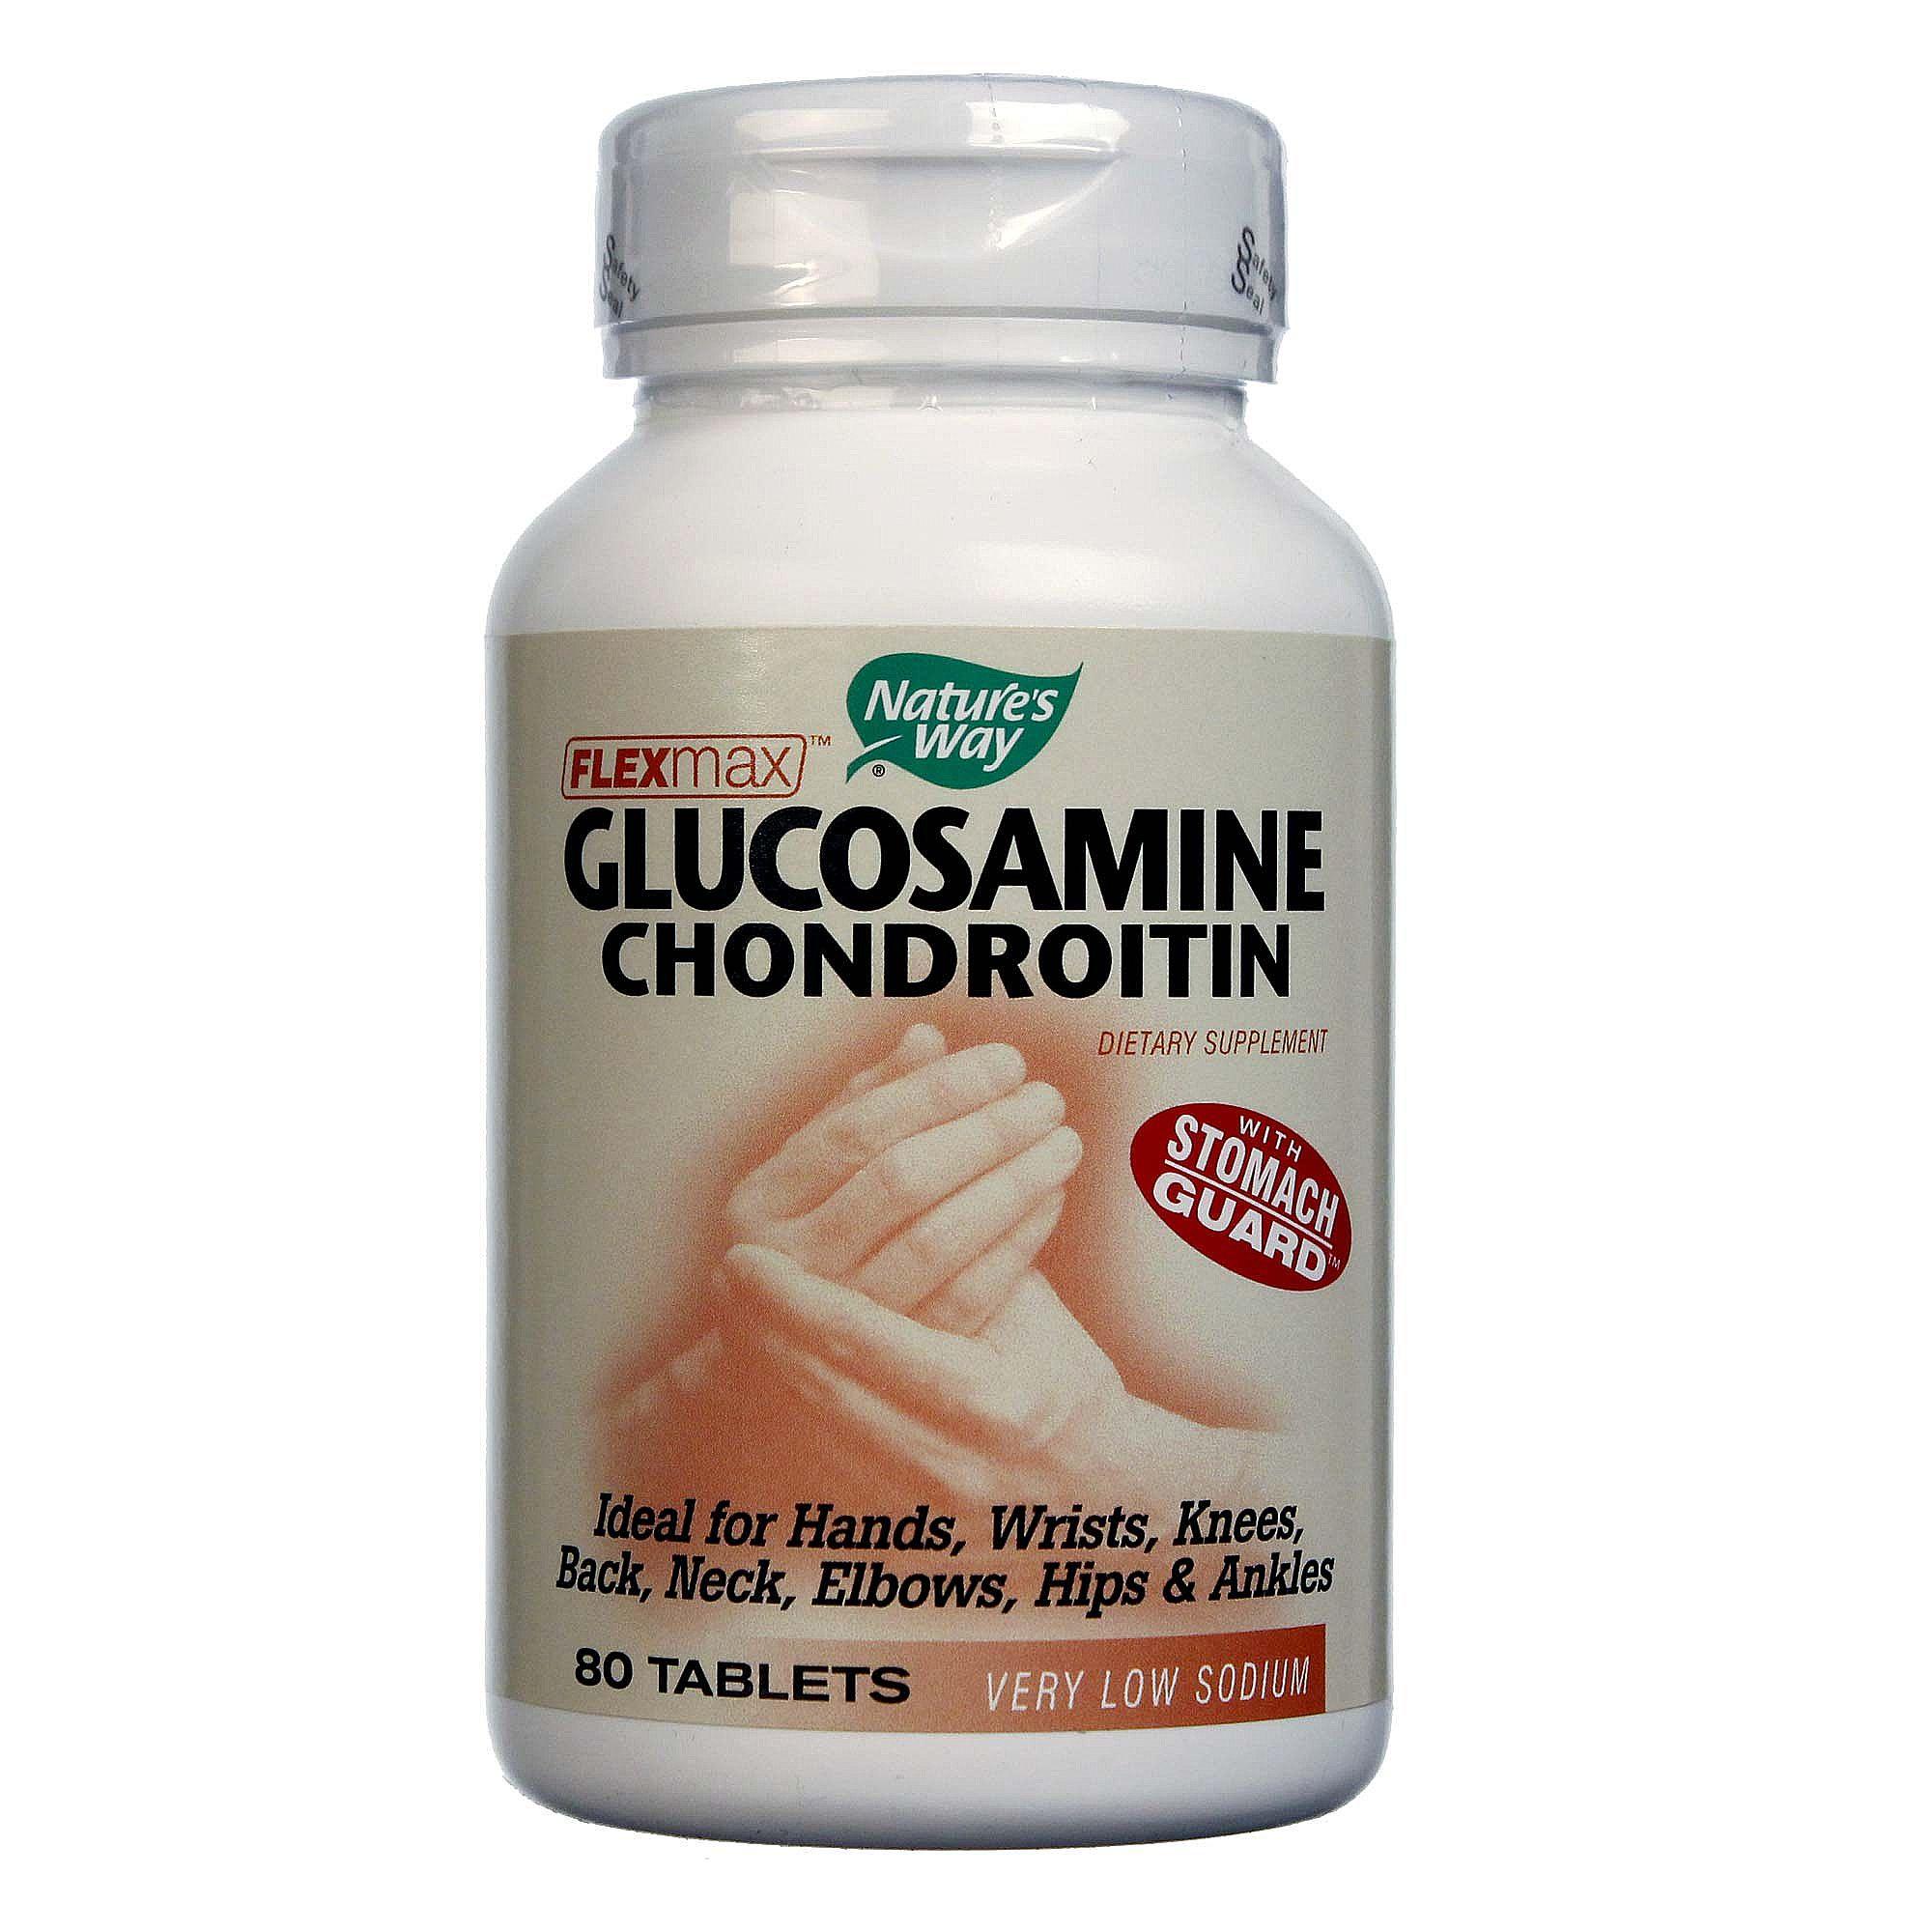 Что такое глюкозамин хондроитин?